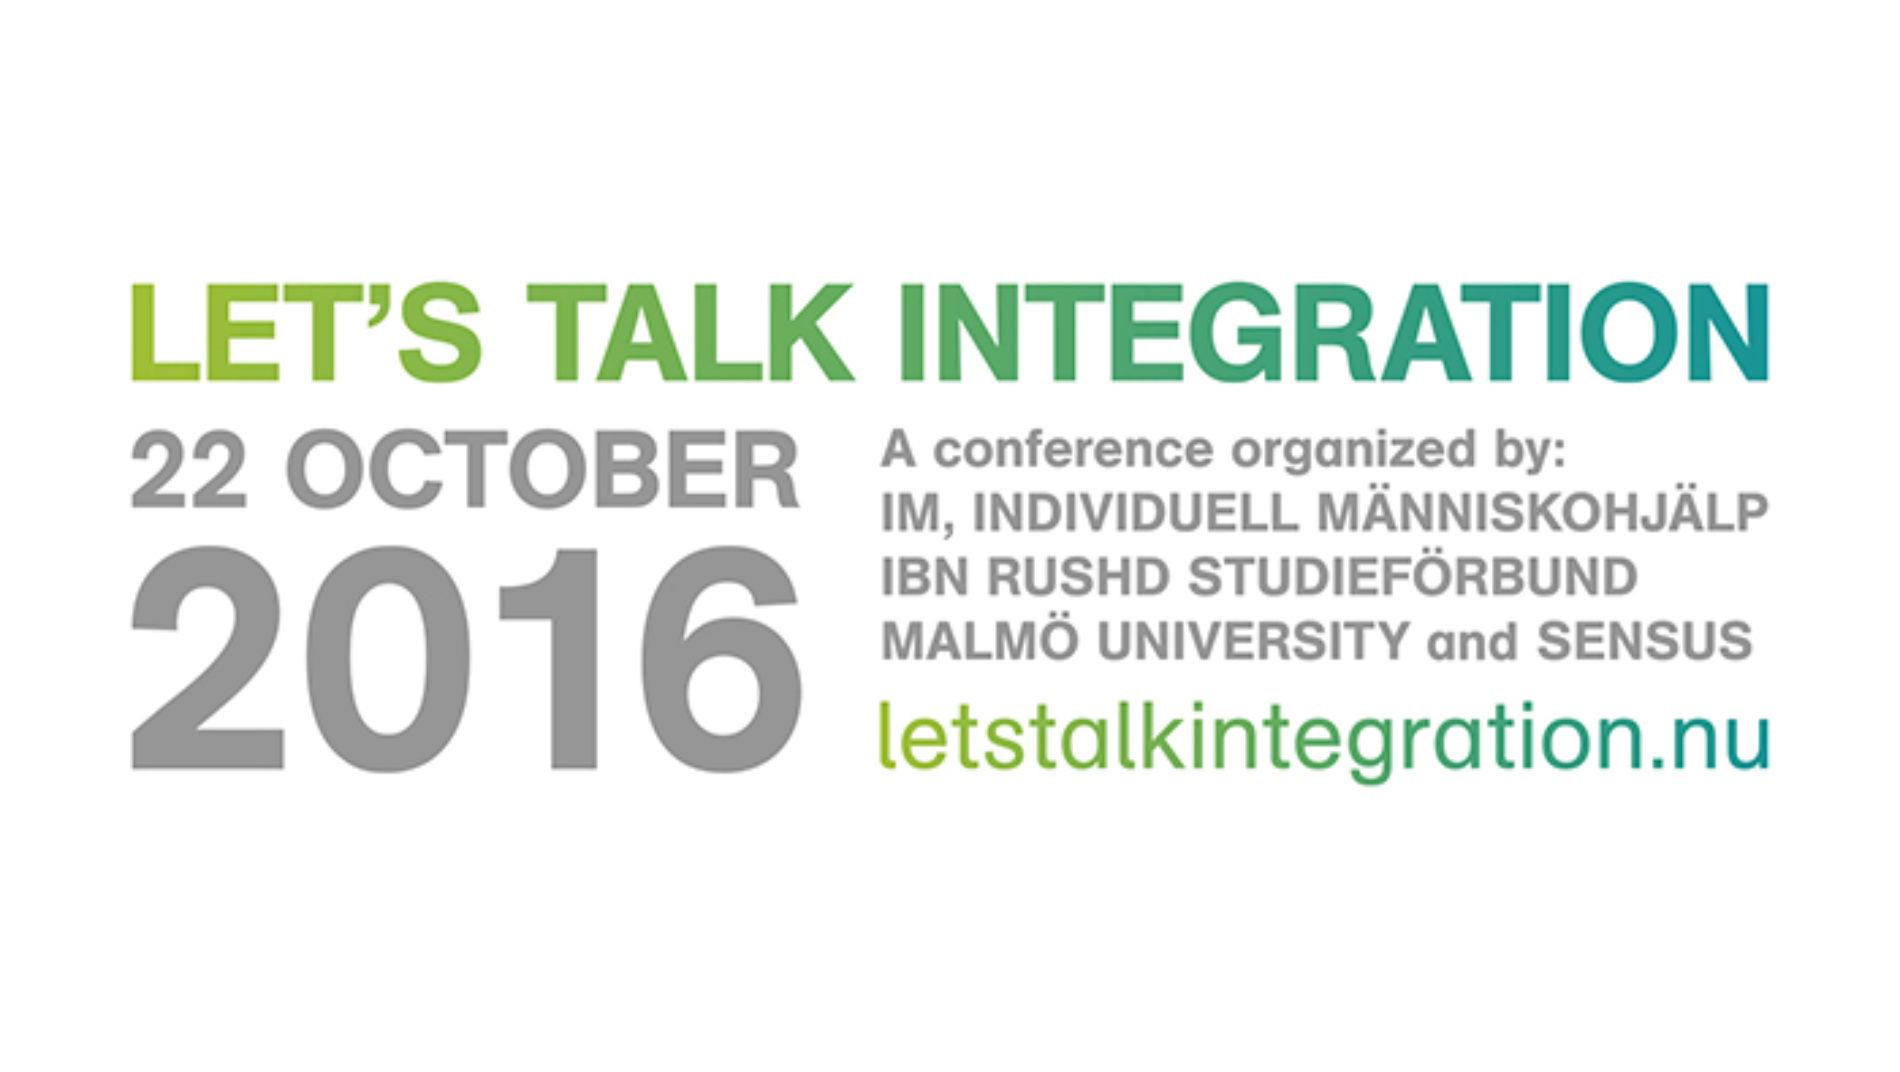 Let's talk integration